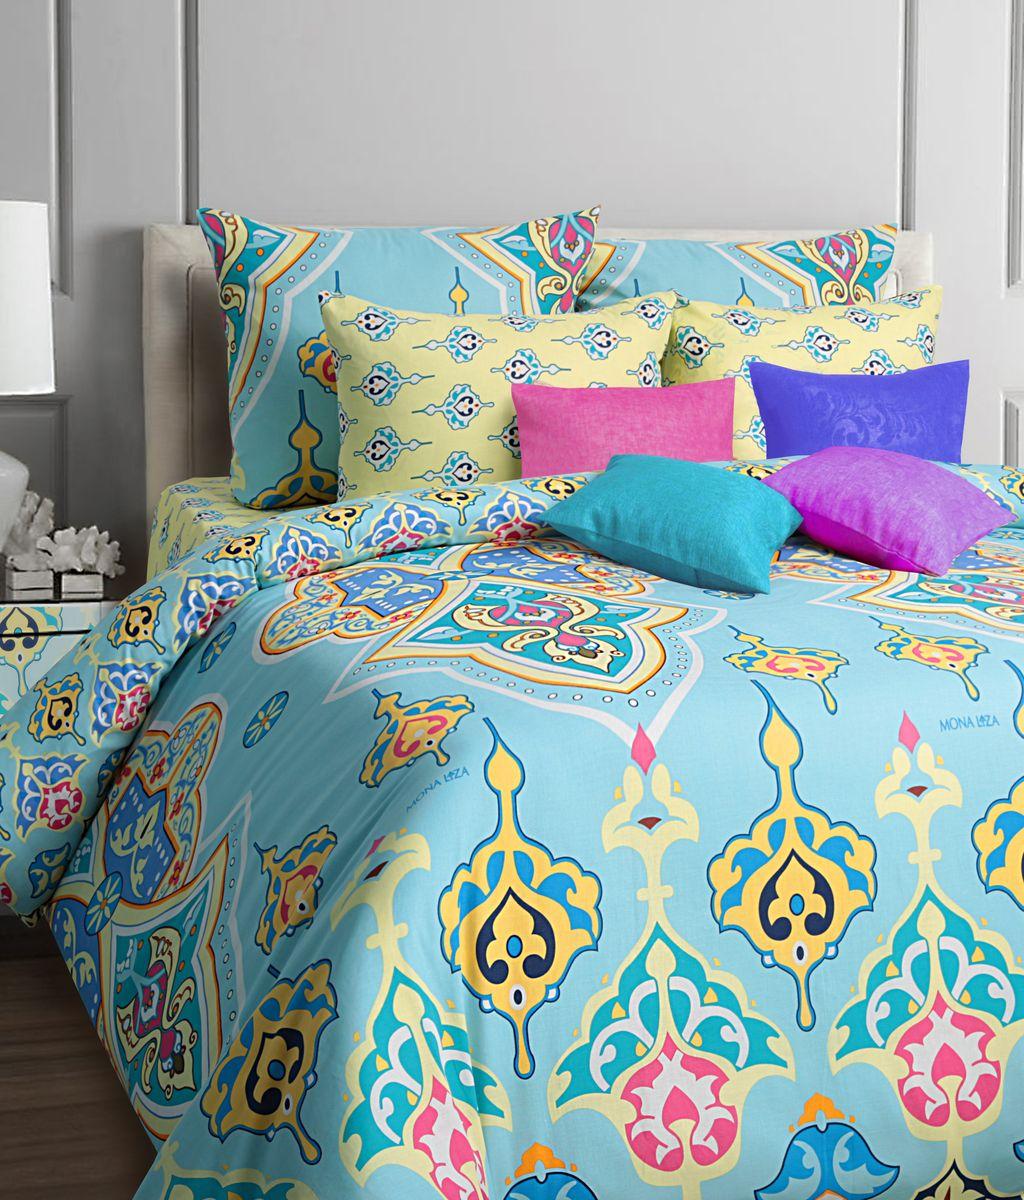 Комплект белья Mona Liza Arabic, 2-спальное, наволочки 70x70, цвет: голубой